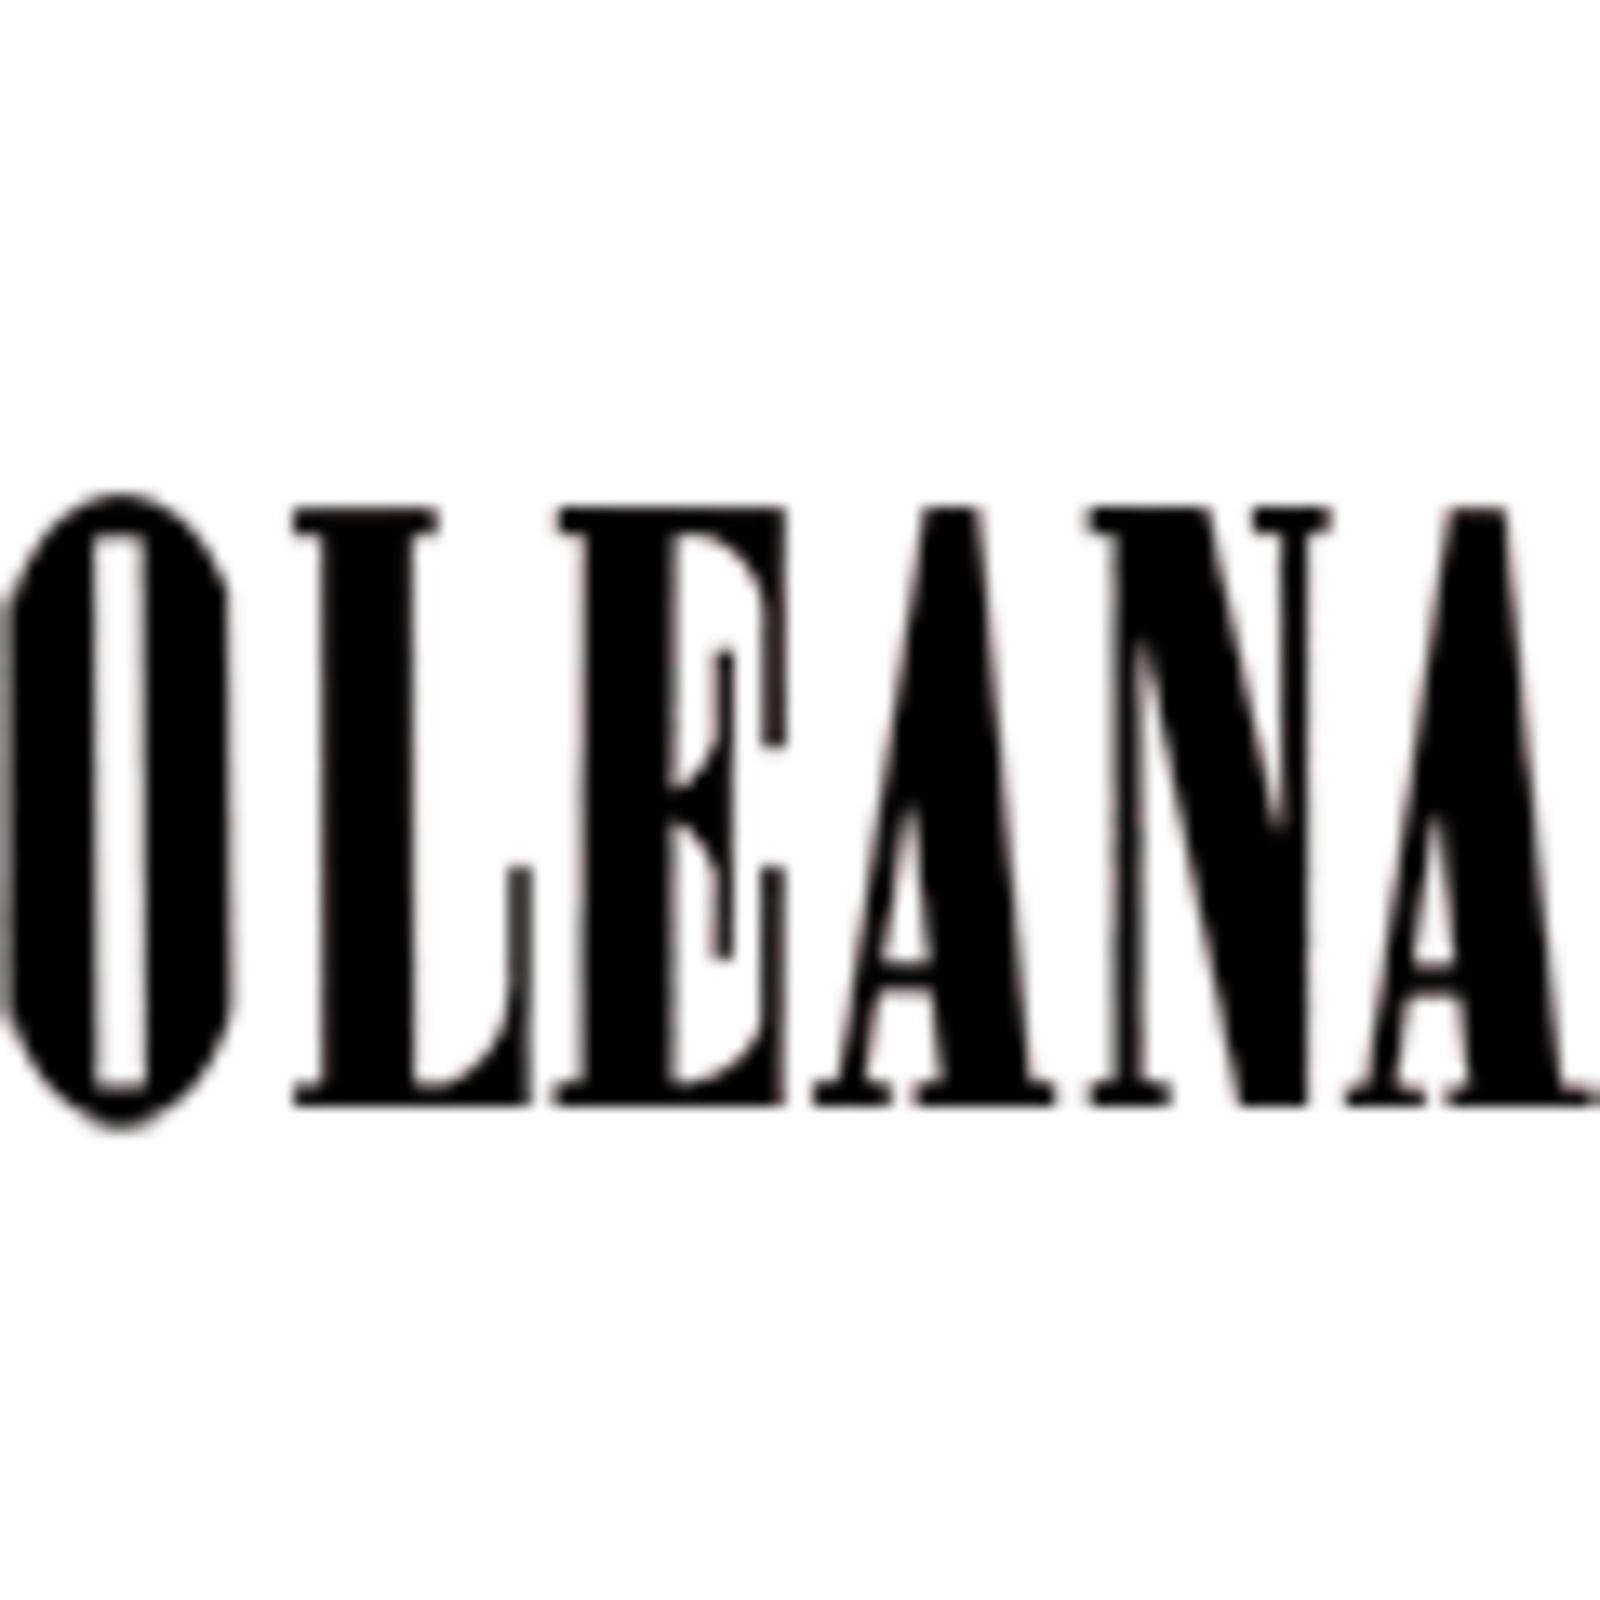 OLEANA Home